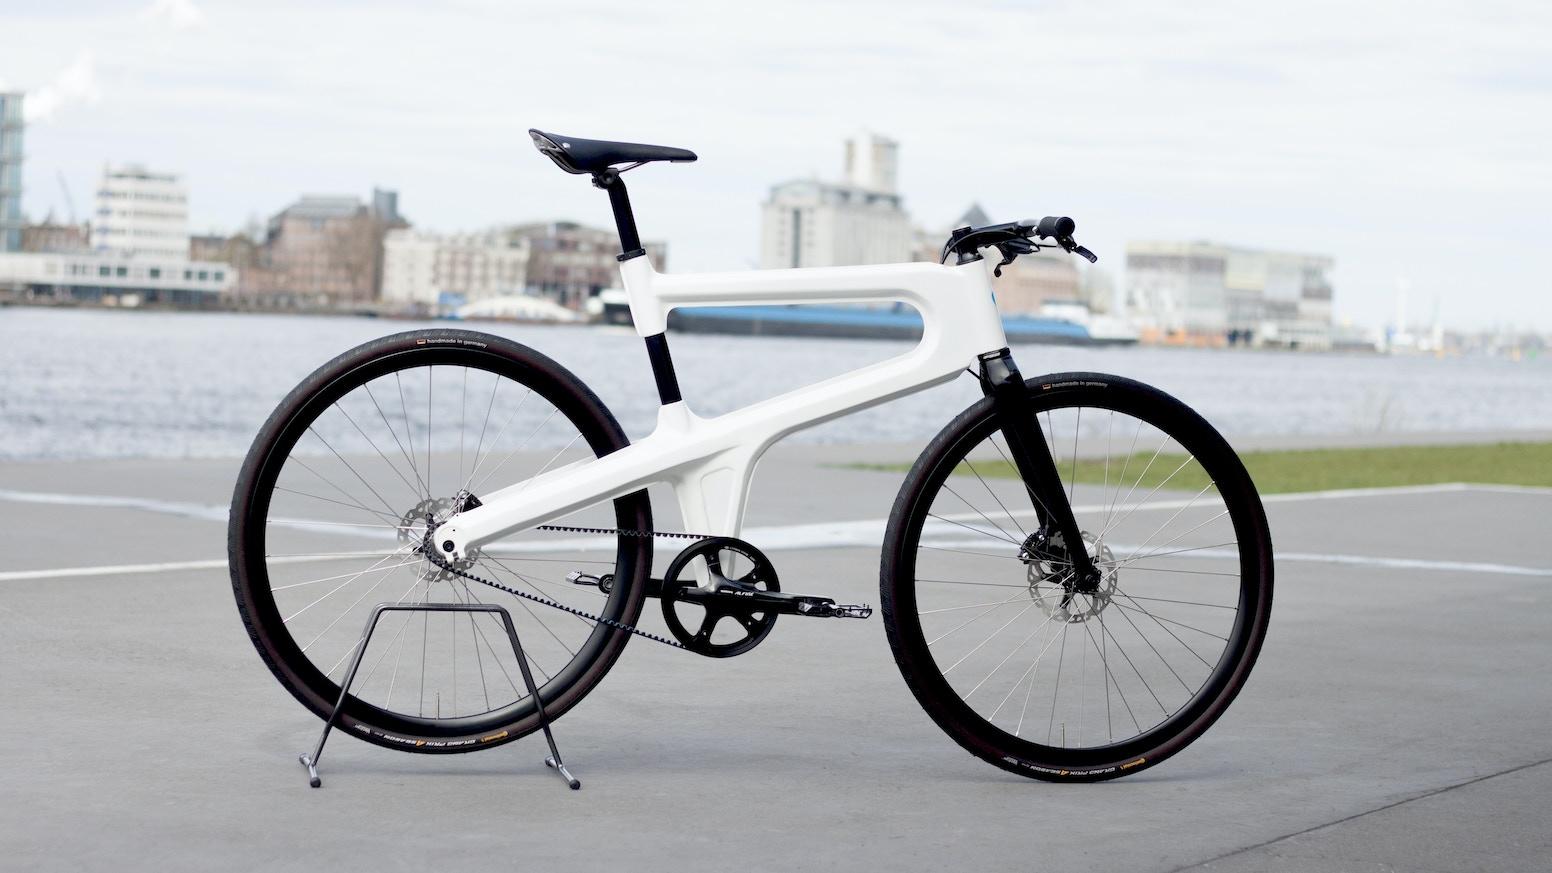 MOKUMONO - A high quality bike built by robots by Bob Schiller ...